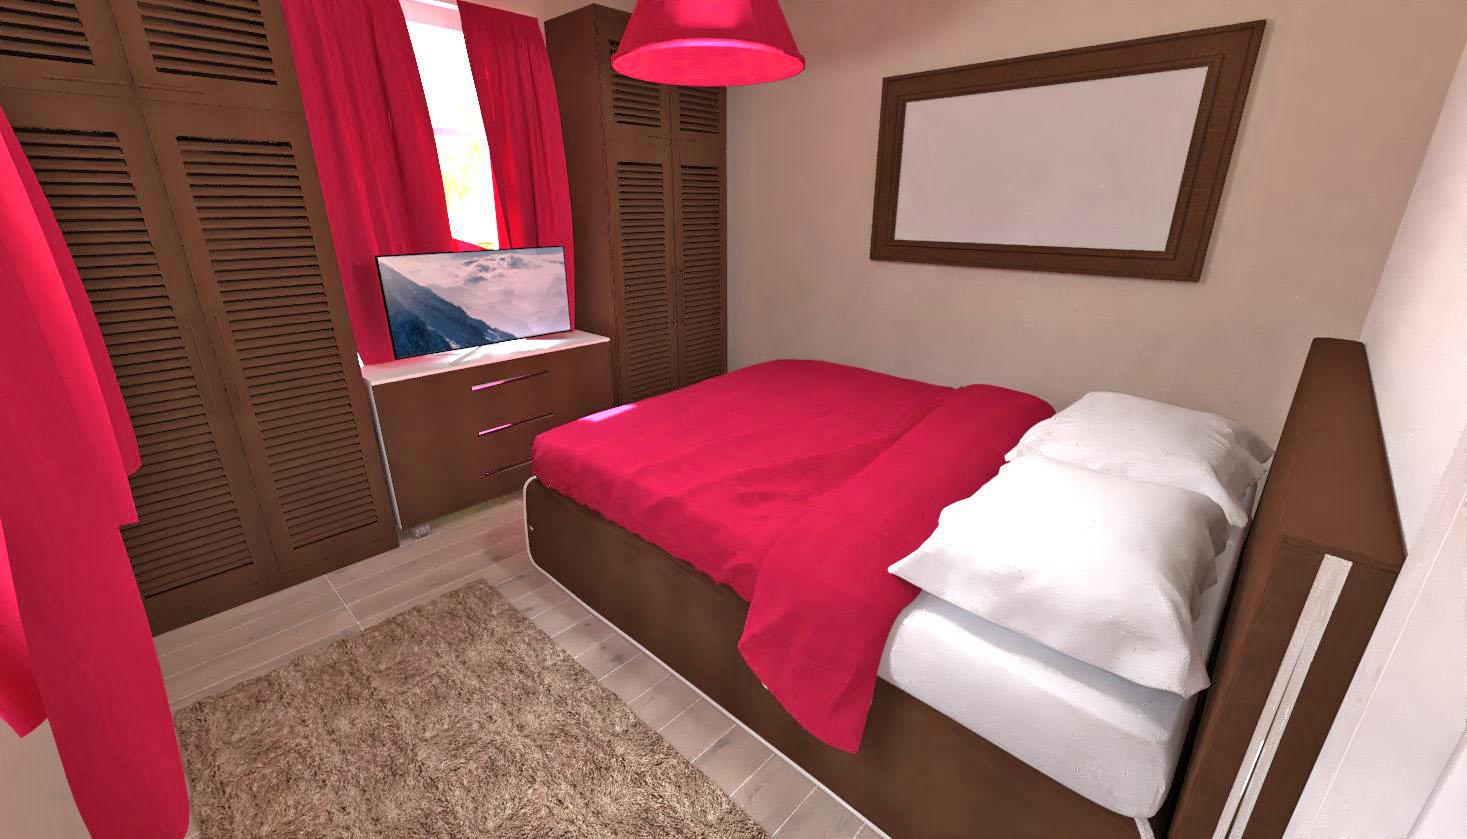 Domus 3D hotelbedroom